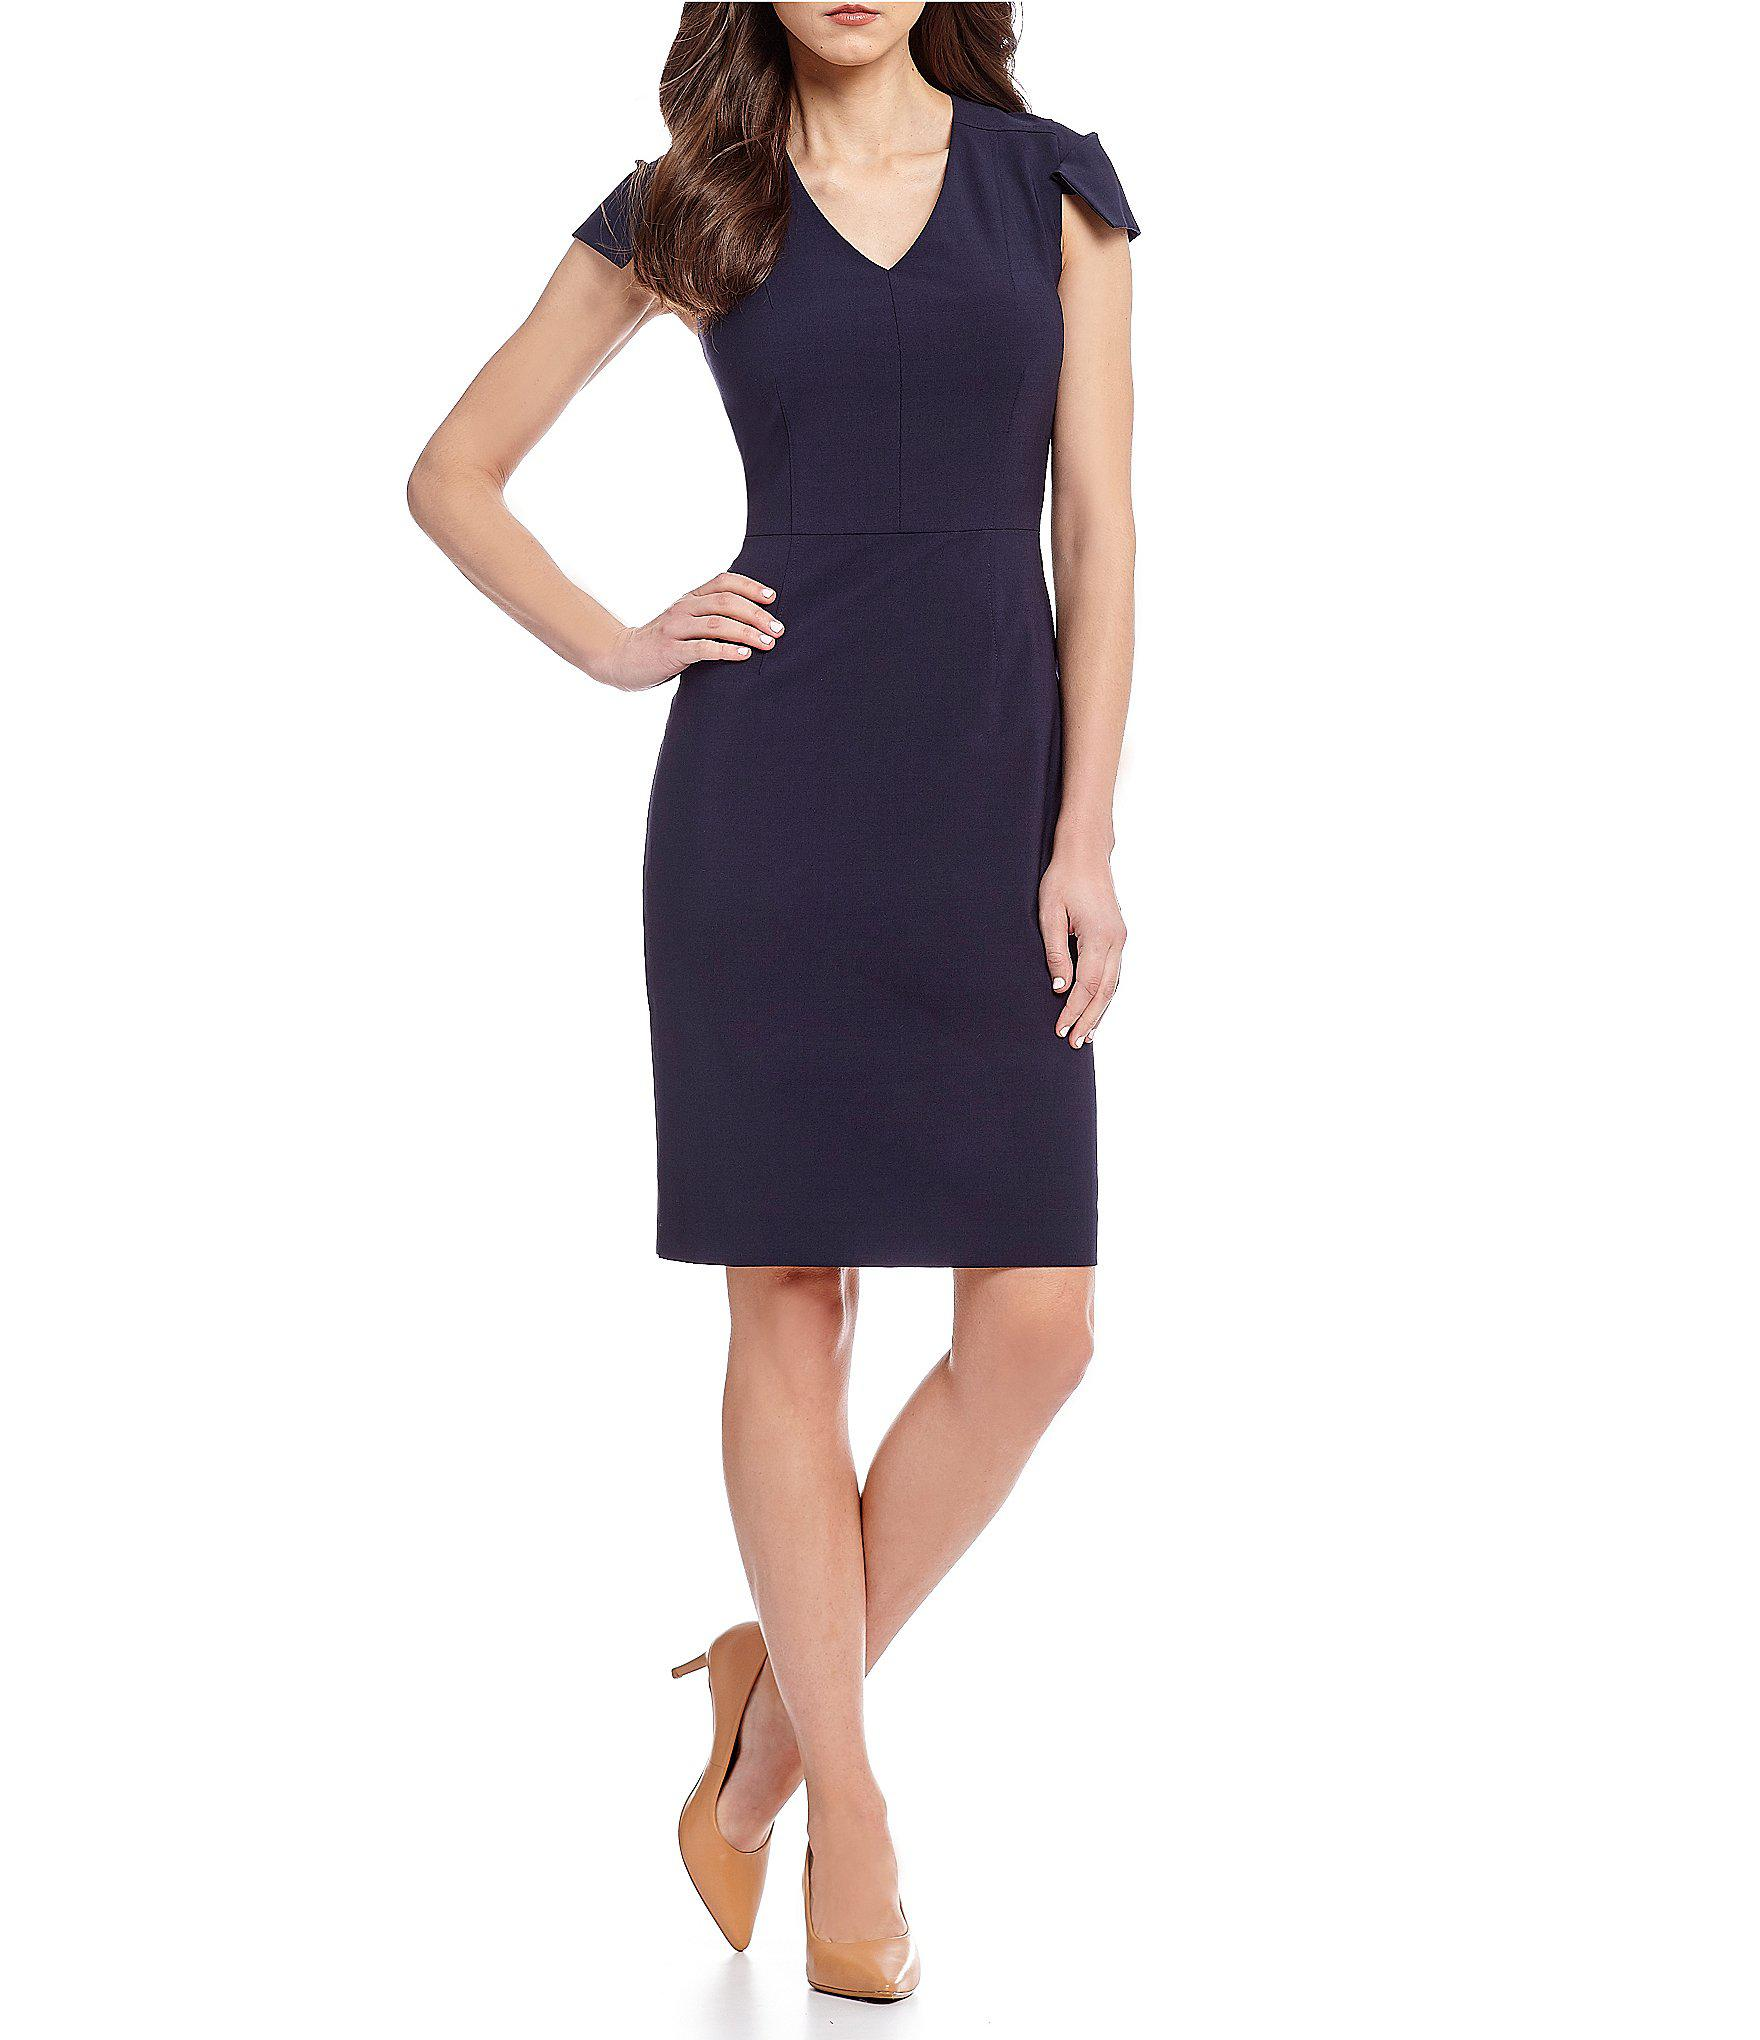 41c4353b904 Antonio Melani Landon Cap Sleeve Dress in Blue - Lyst